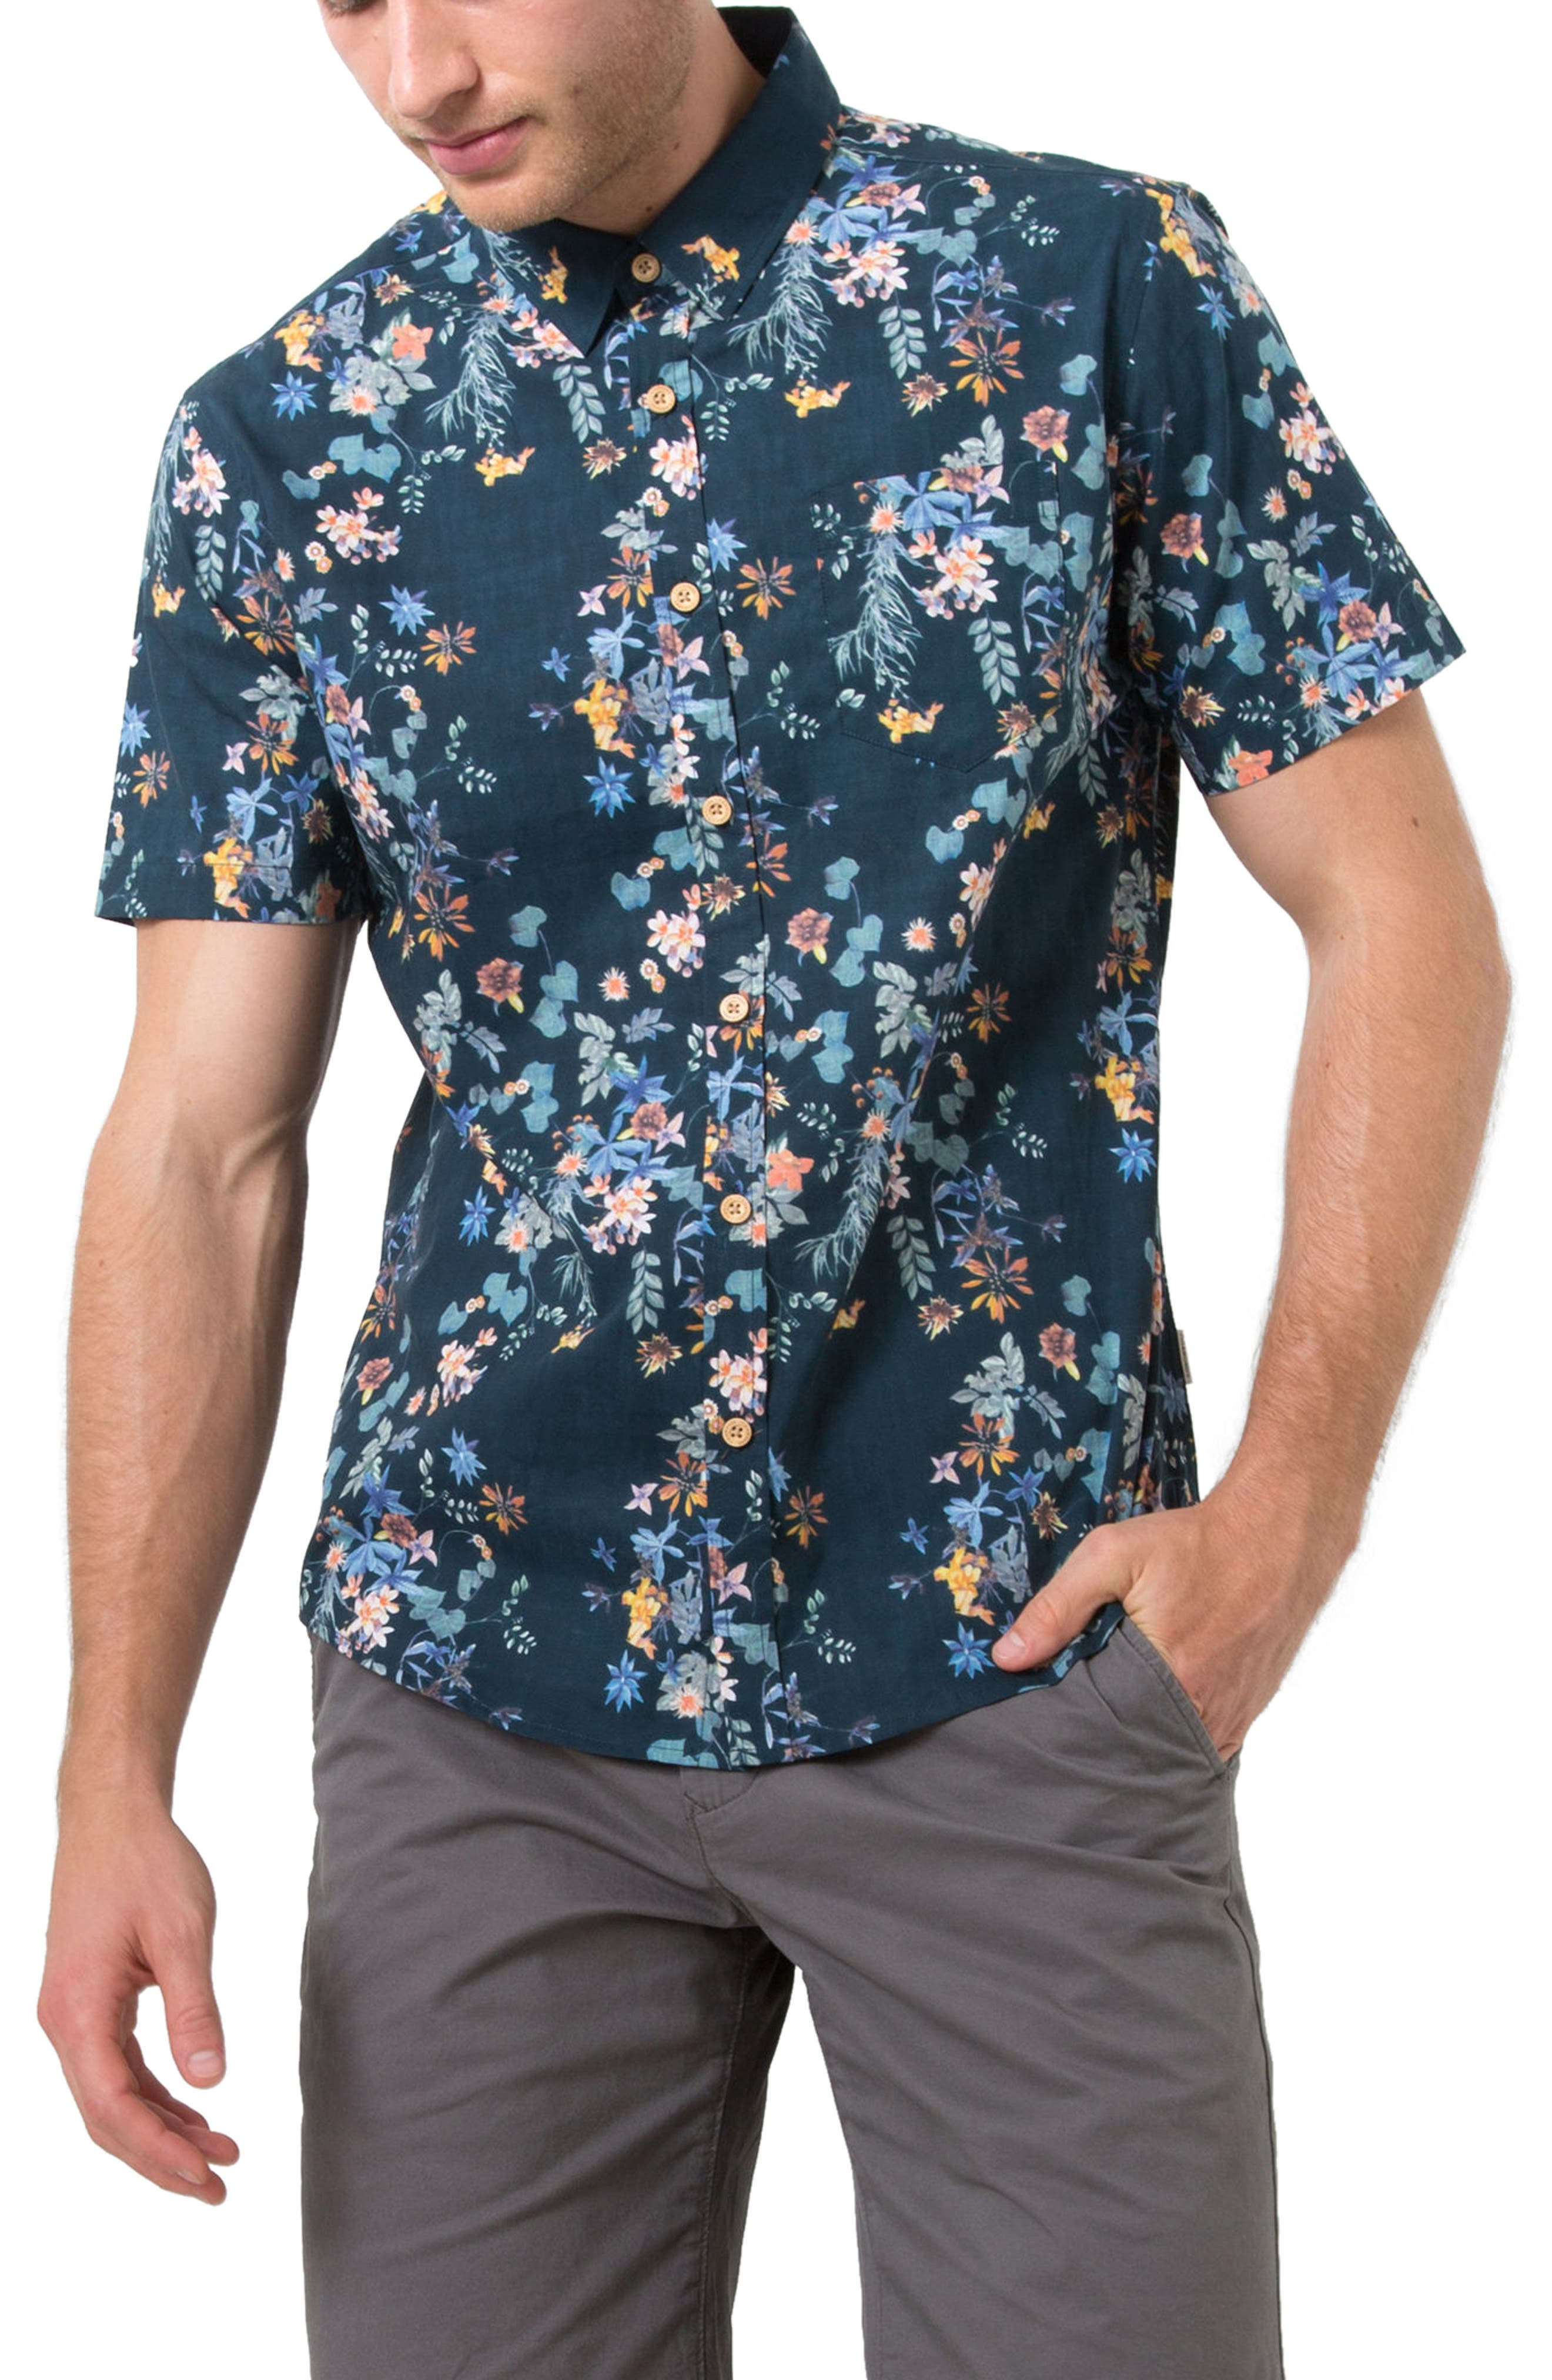 7 Diamonds Meadows Floral Print Shirt